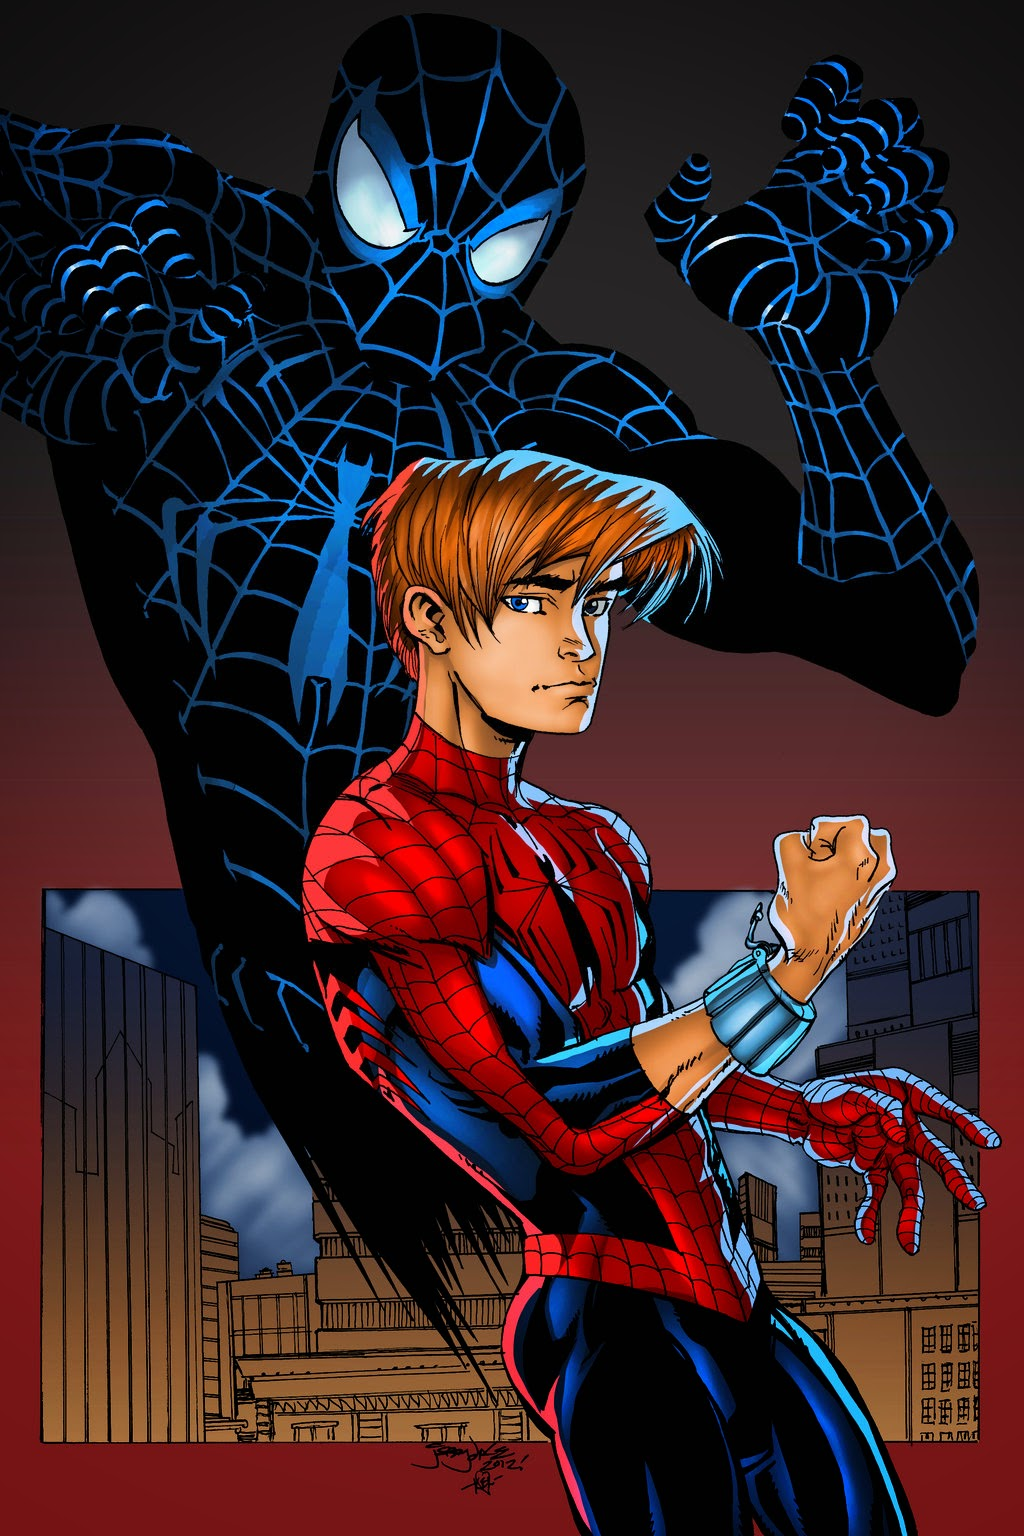 Kumpulan Gambar Ultimate Spider-Man | Gambar Lucu Terbaru ...